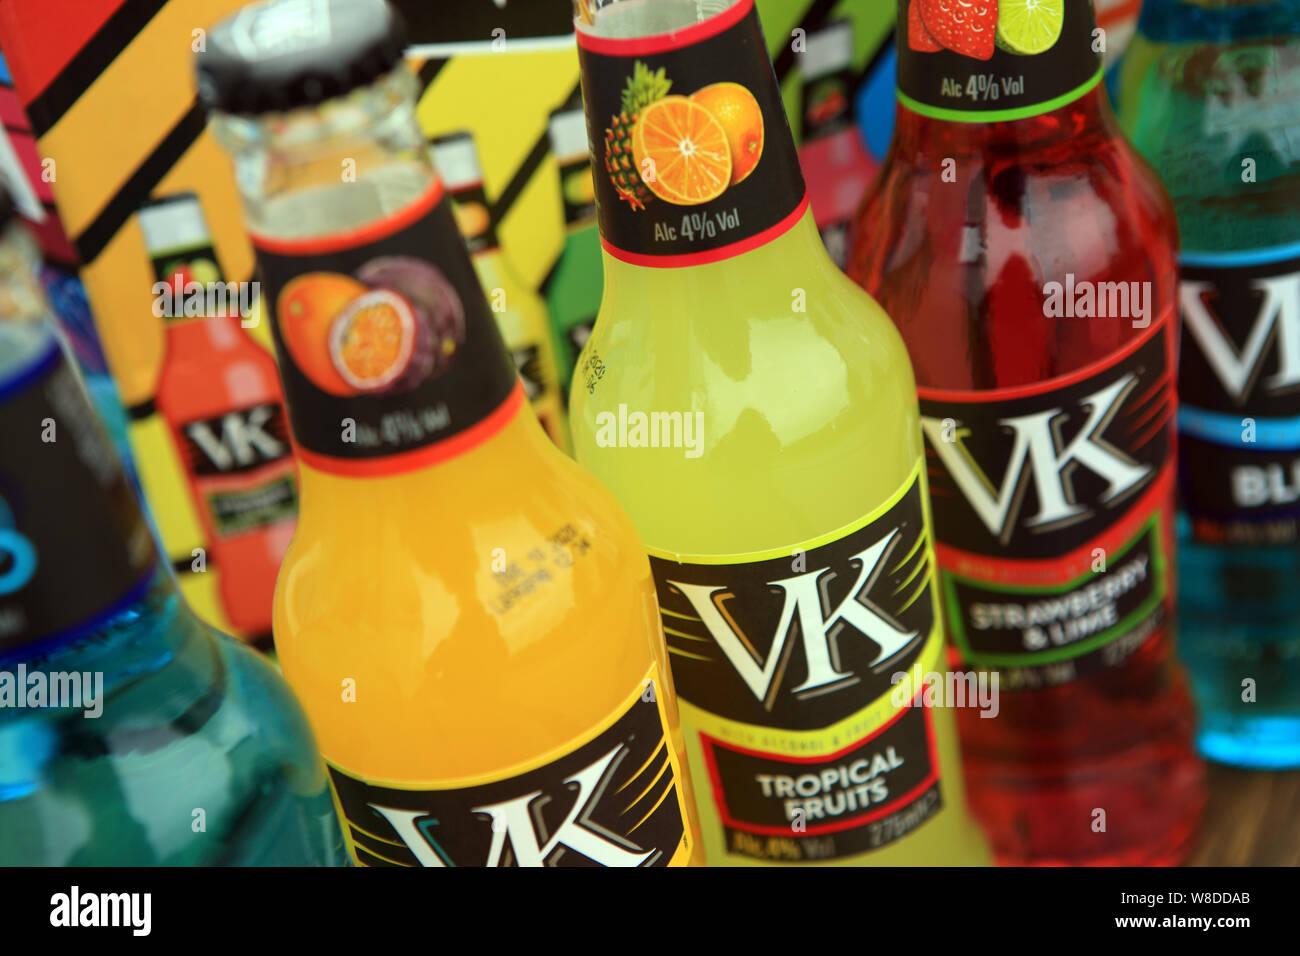 Vk Stock Photos & Vk Stock Images - Alamy